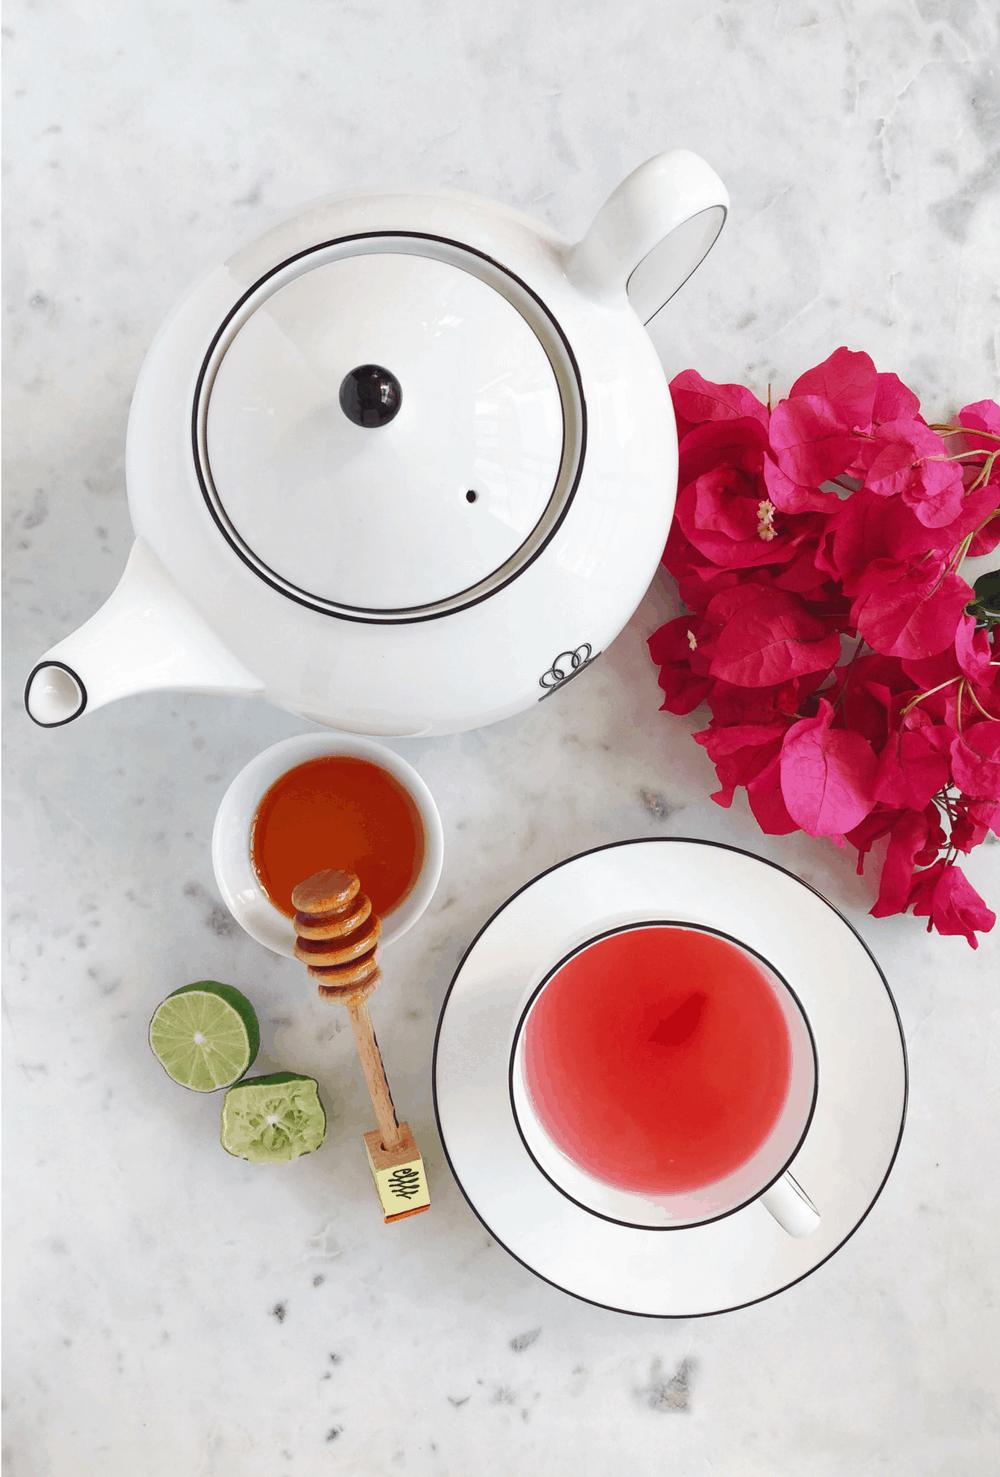 How to make té de bugambilias via theothersideofthetortilla.com